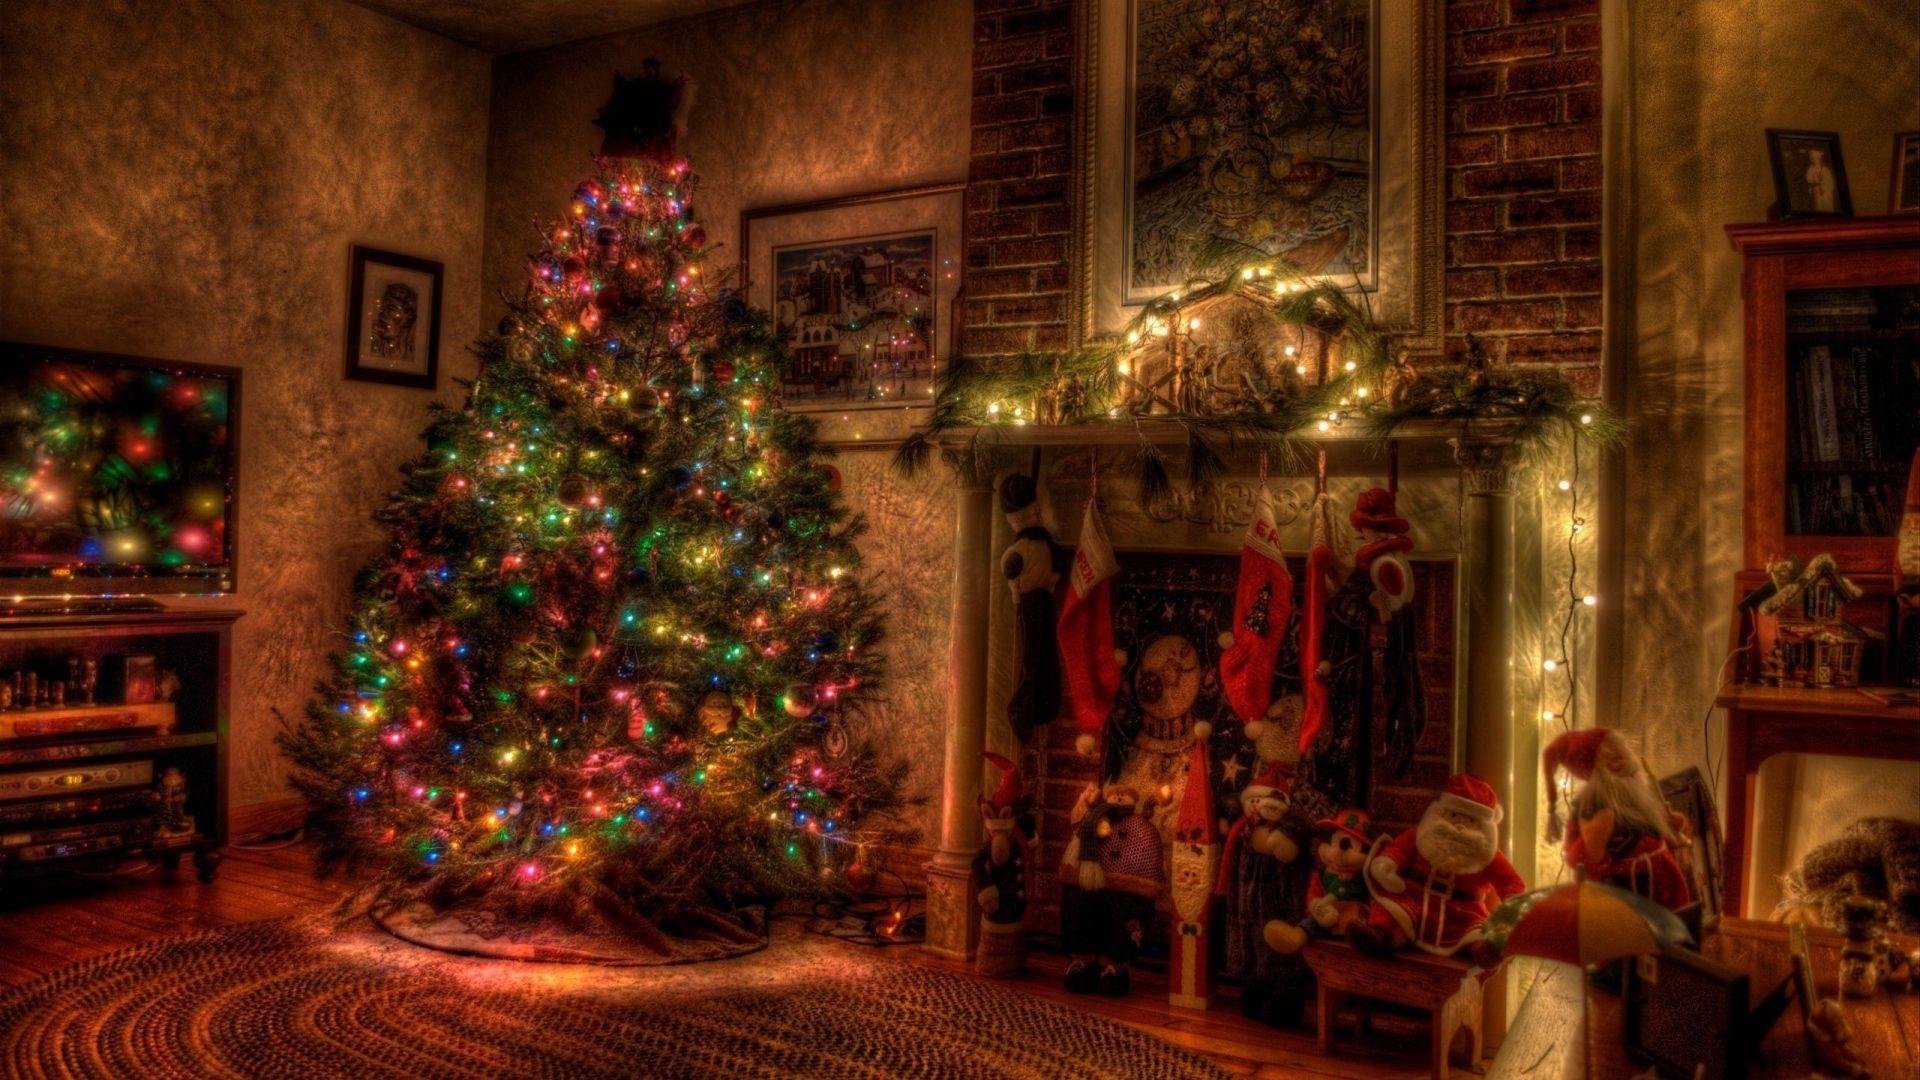 Full Hd 1080p Holidays Wallpapers Desktop Backgrounds Hd Christmas Wallpaper Backgrounds Christmas Fireplace Christmas Wallpaper Hd